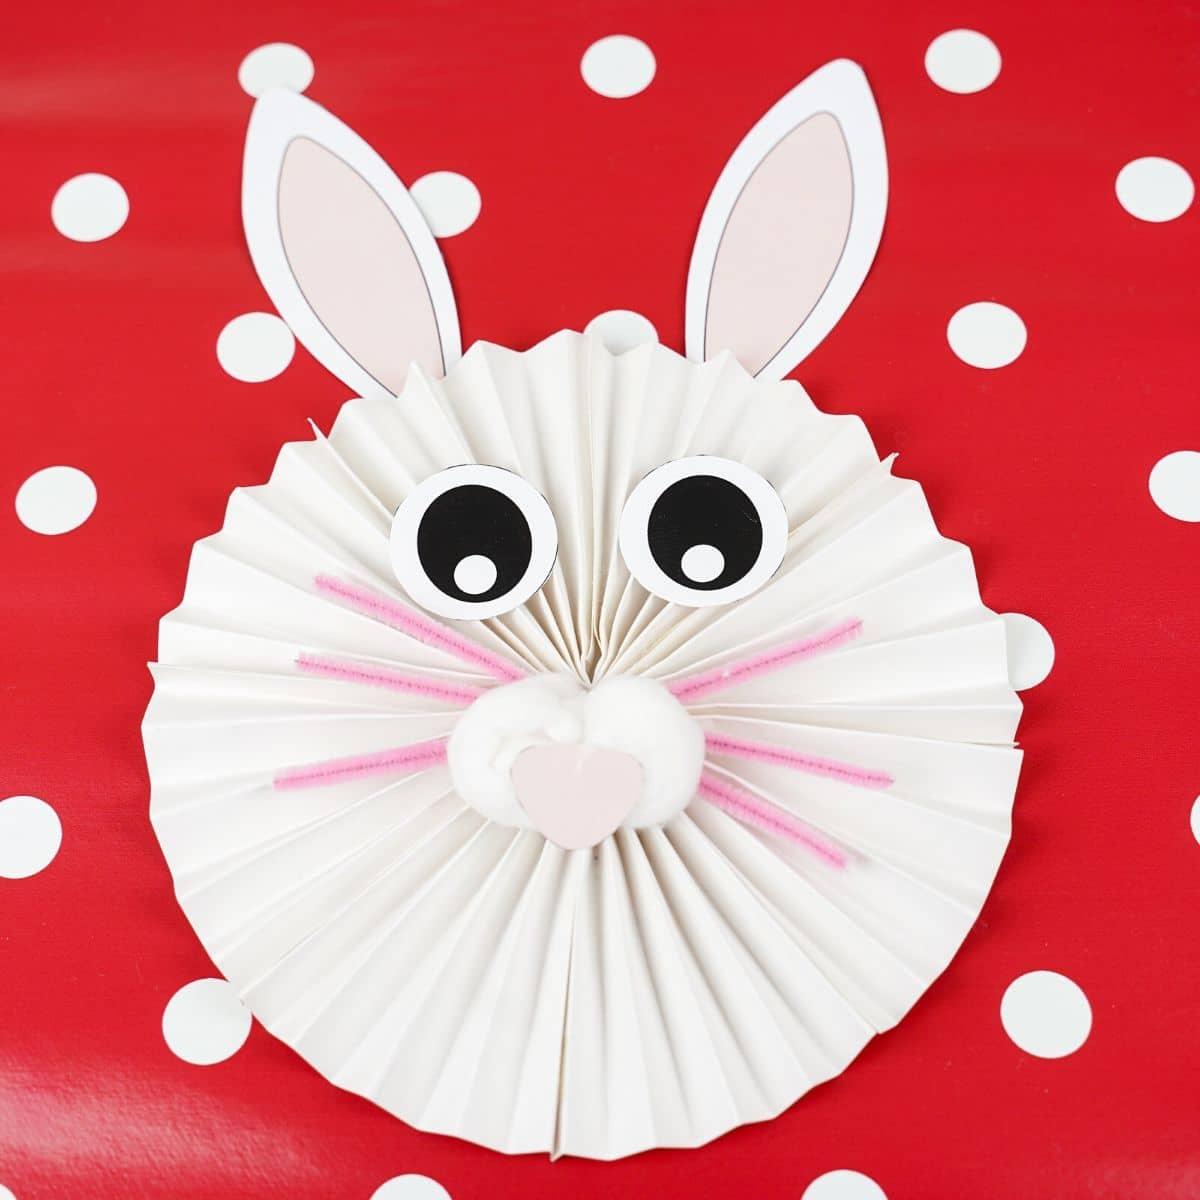 Adorable Paper Fan Bunny Wall Art Decoration